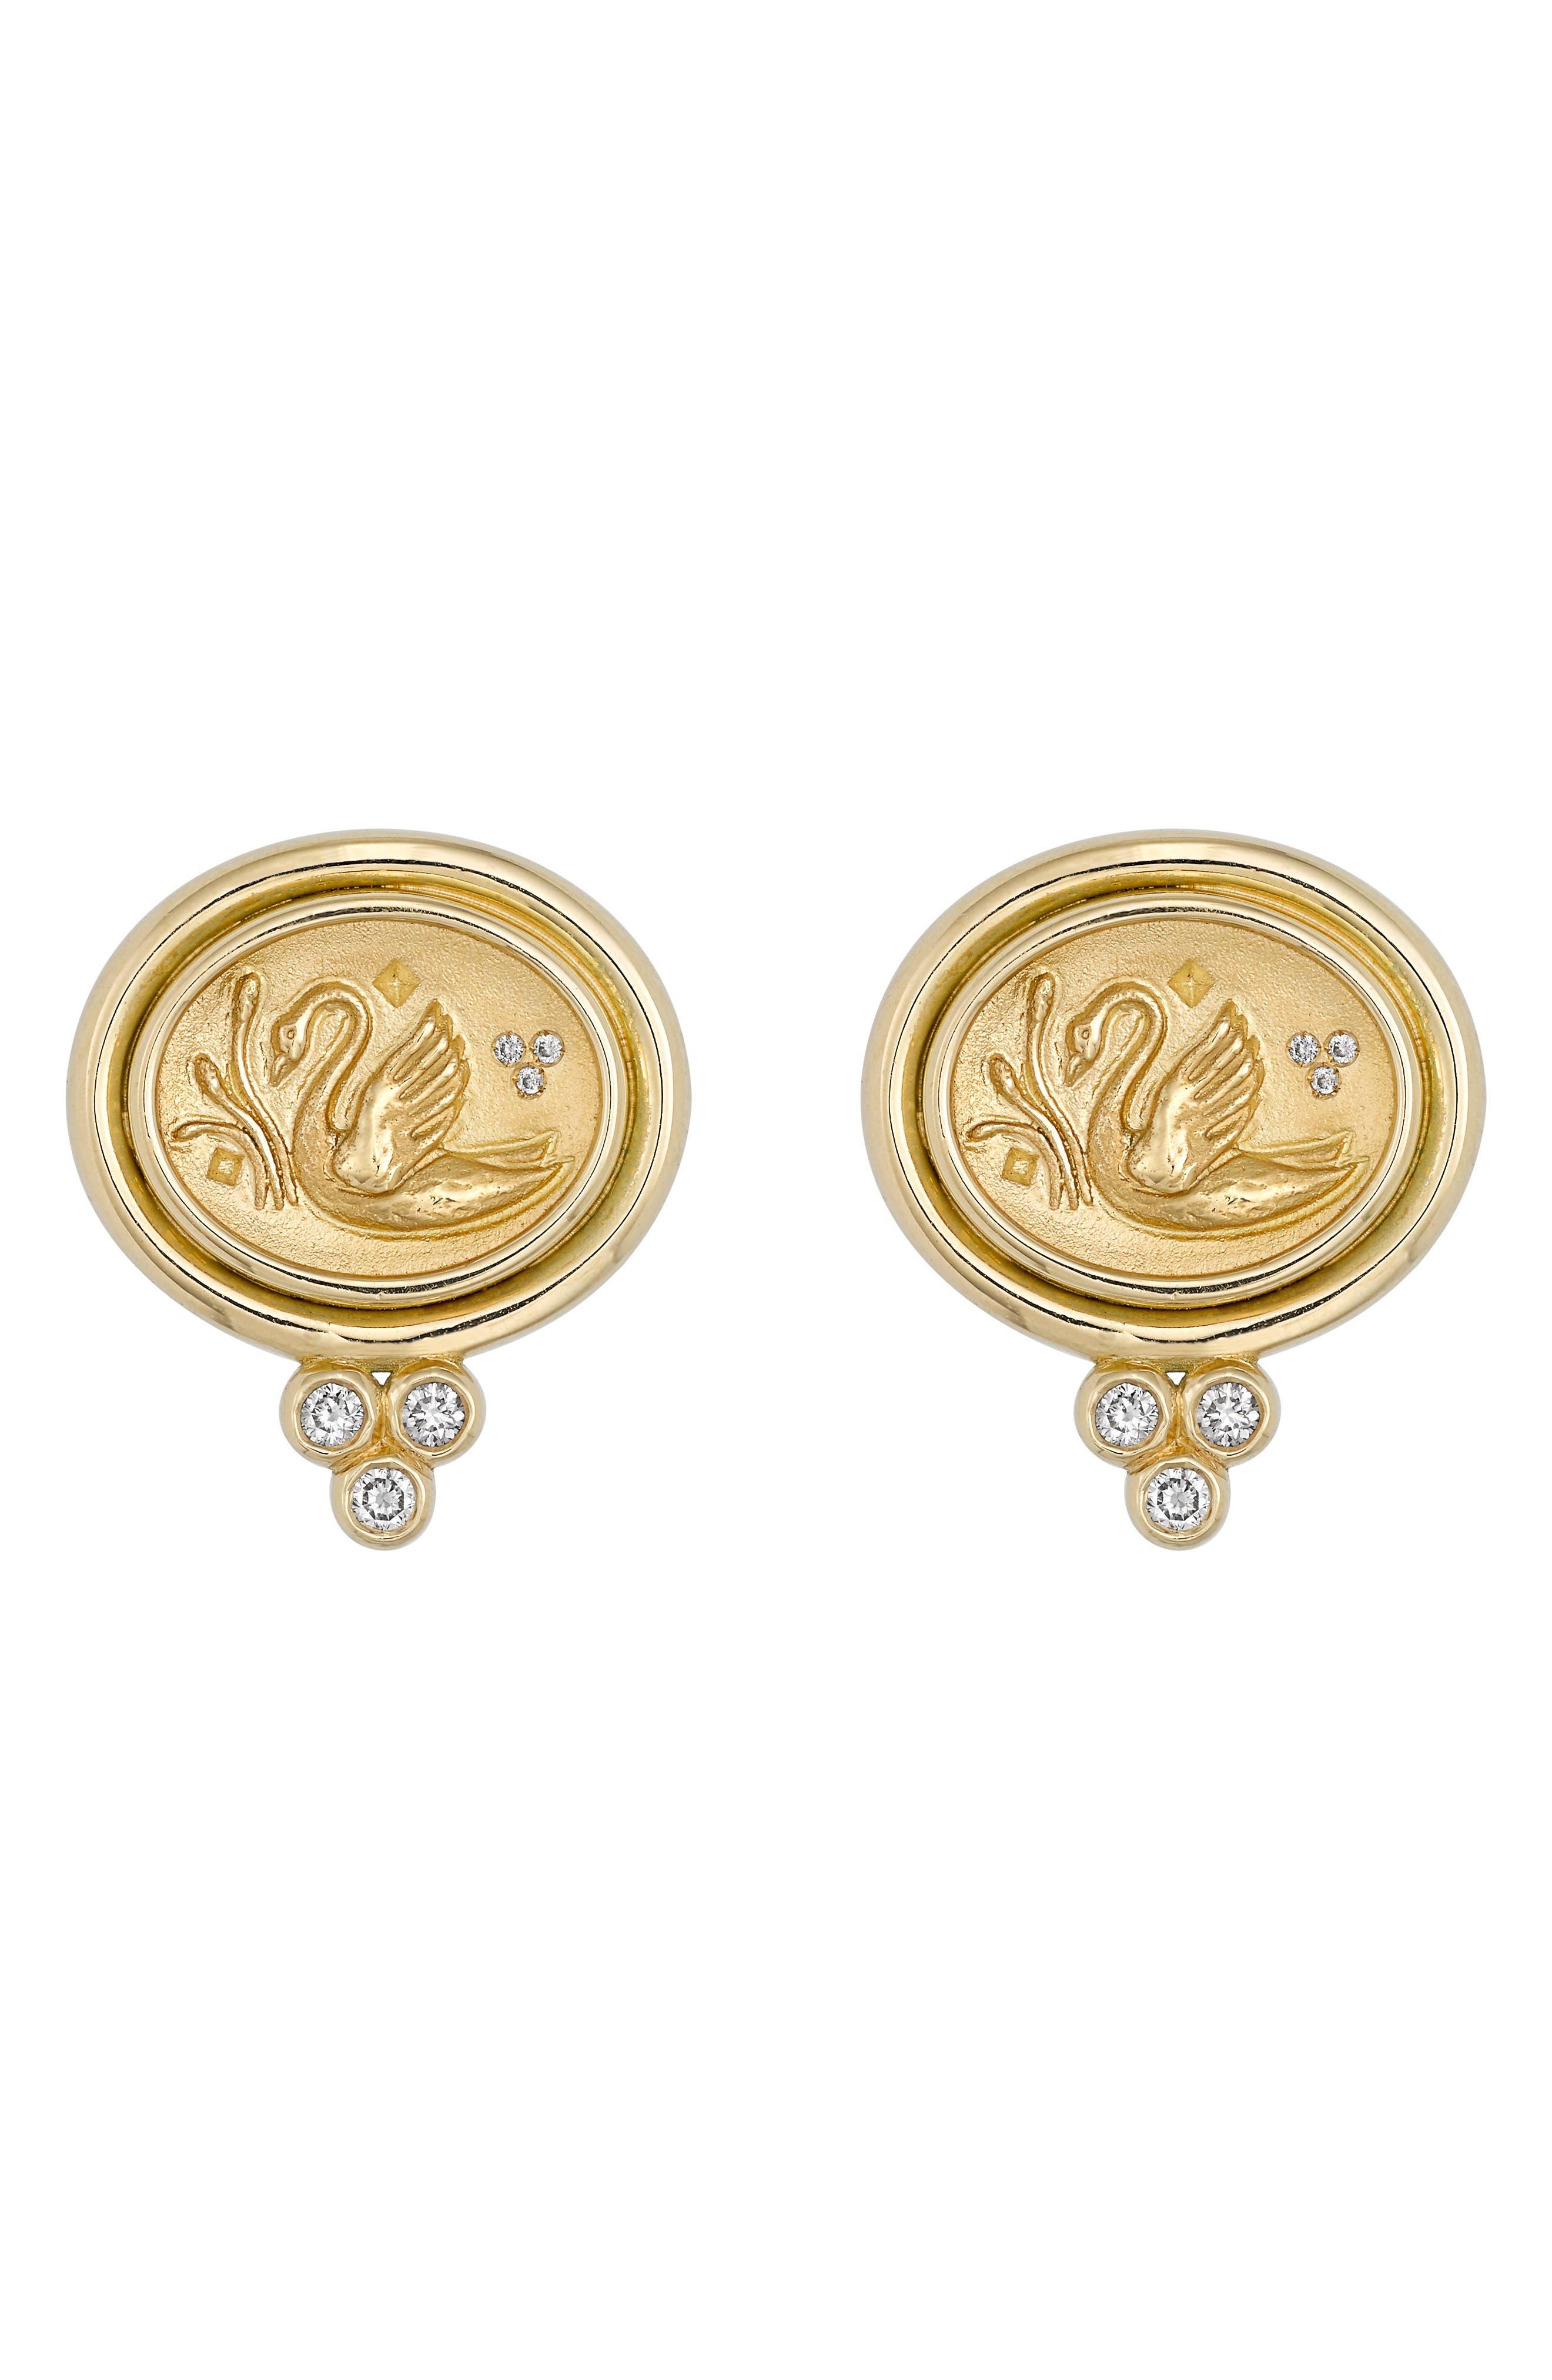 Main Image - Temple St. Clair Object Trouvé Diamond Coin Earrings